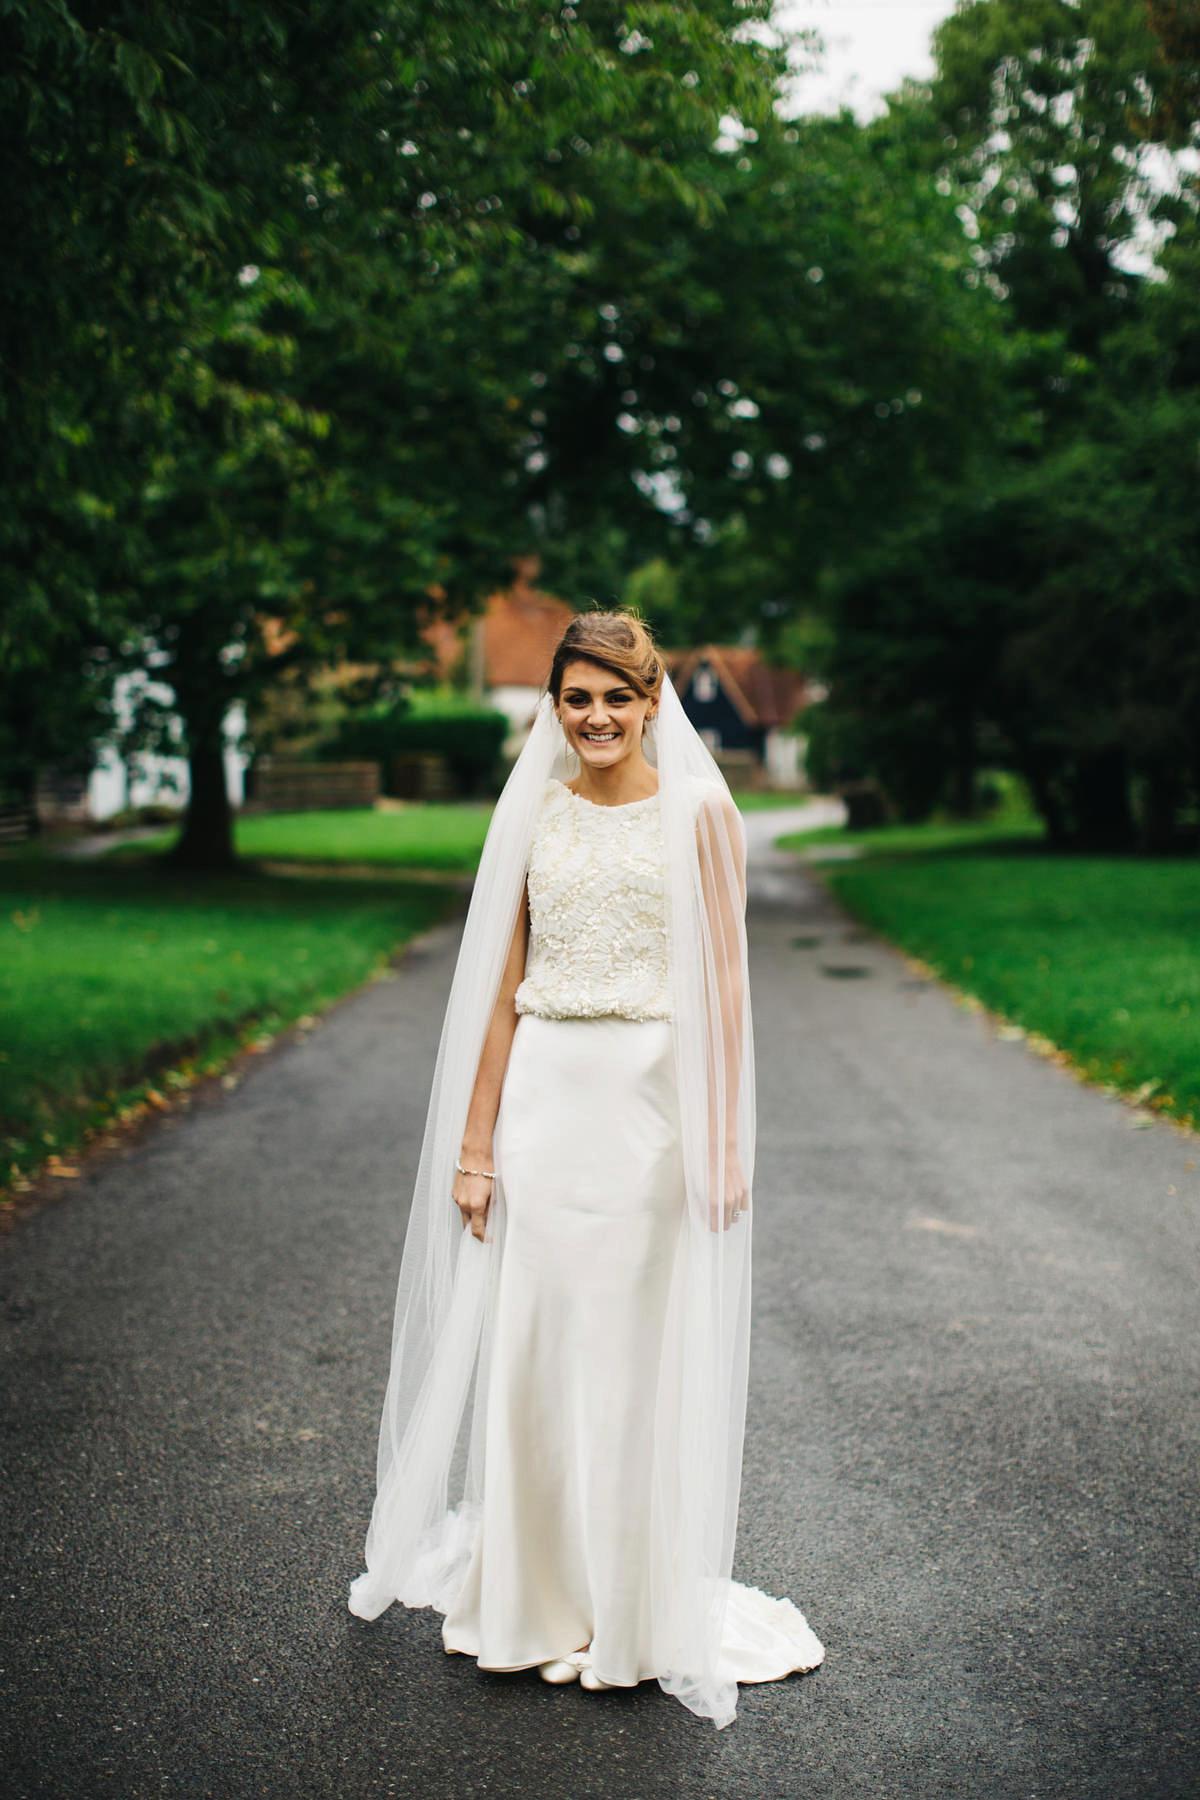 32a231bf4 ... ritva westenius back garden wedding at home - A Ritva Westenius Gown  for a Glamorous Black ...